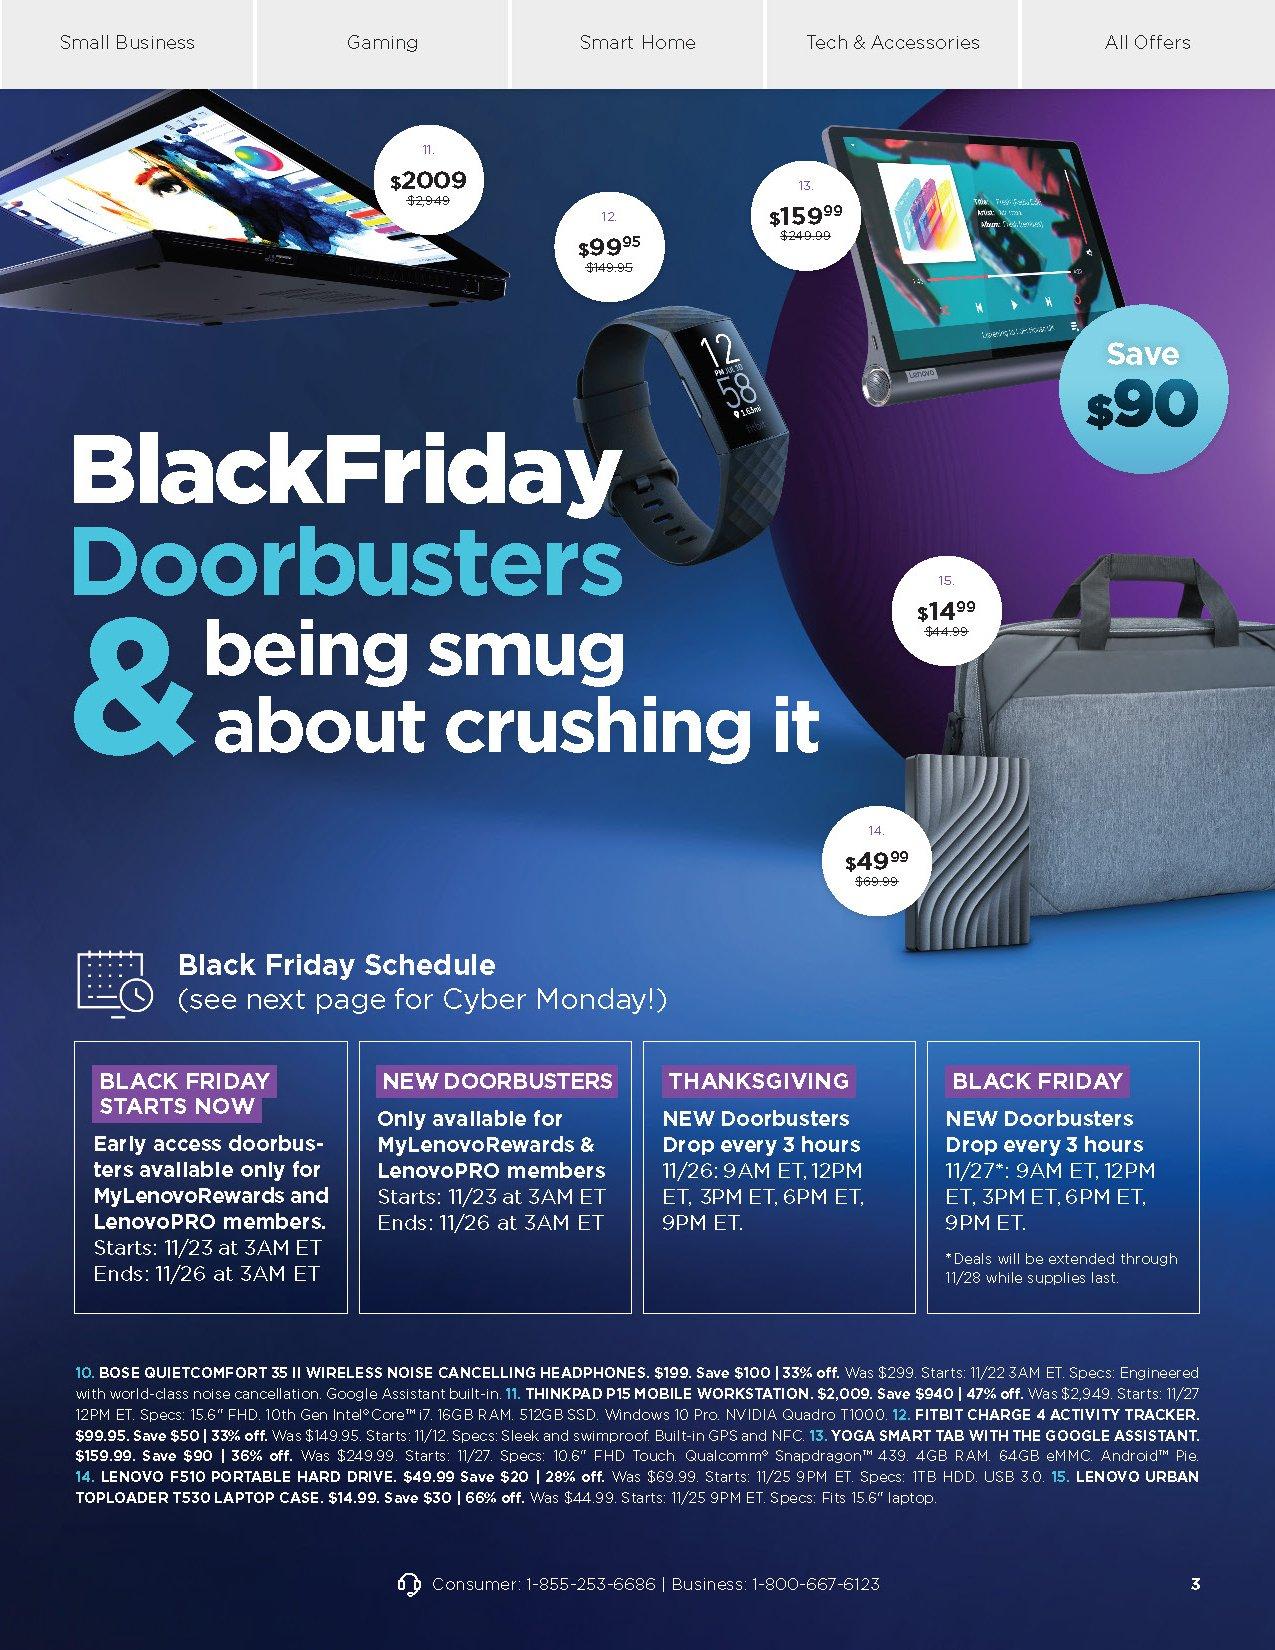 Lenovo Black Friday 2020 Page 3